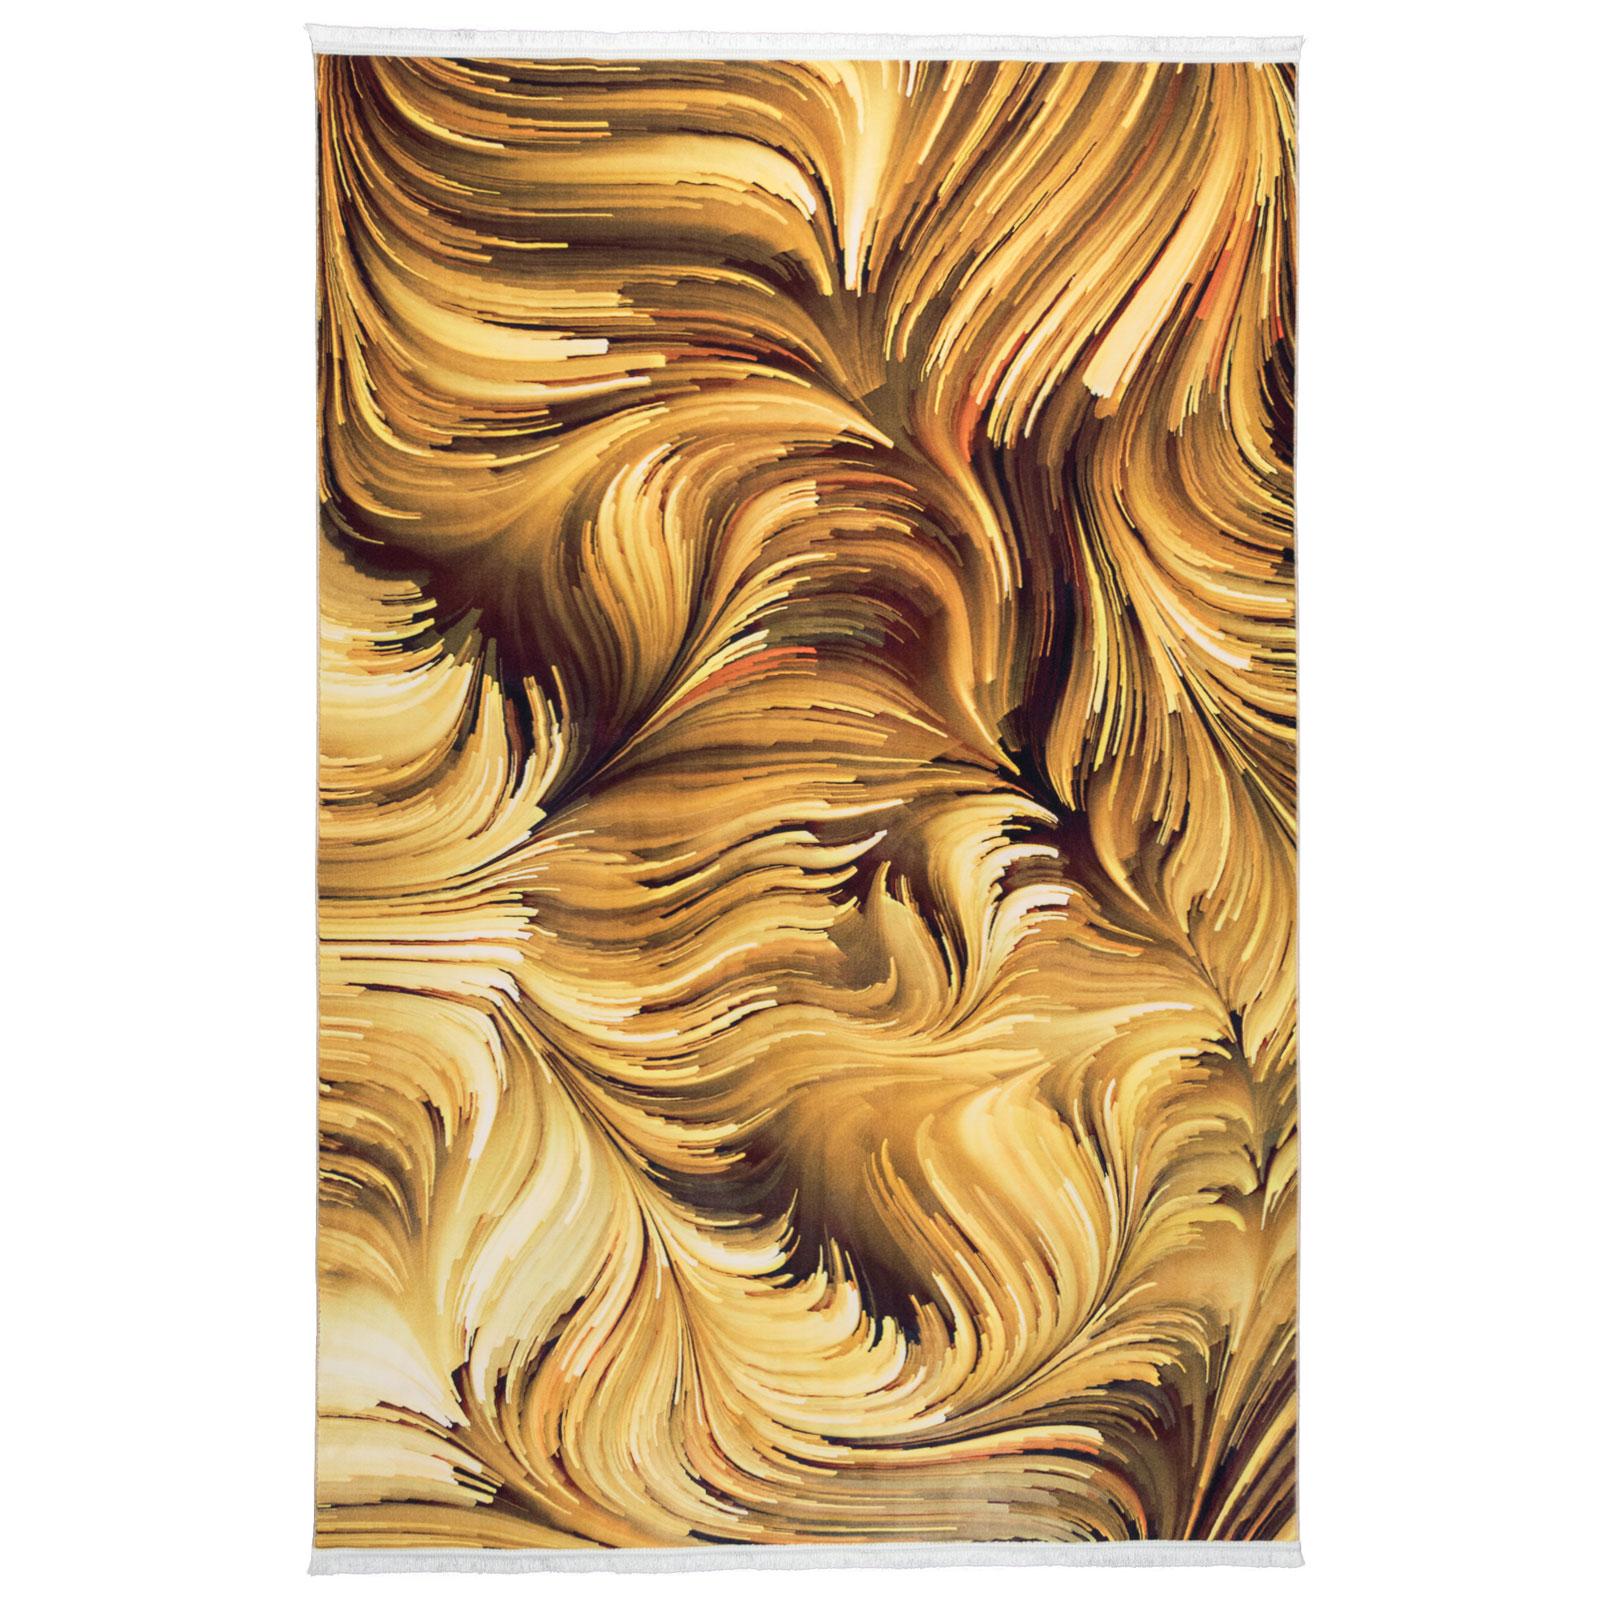 فرش ماشینی محتشم طرح آبرنگی کد 100432 زمینه طلایی